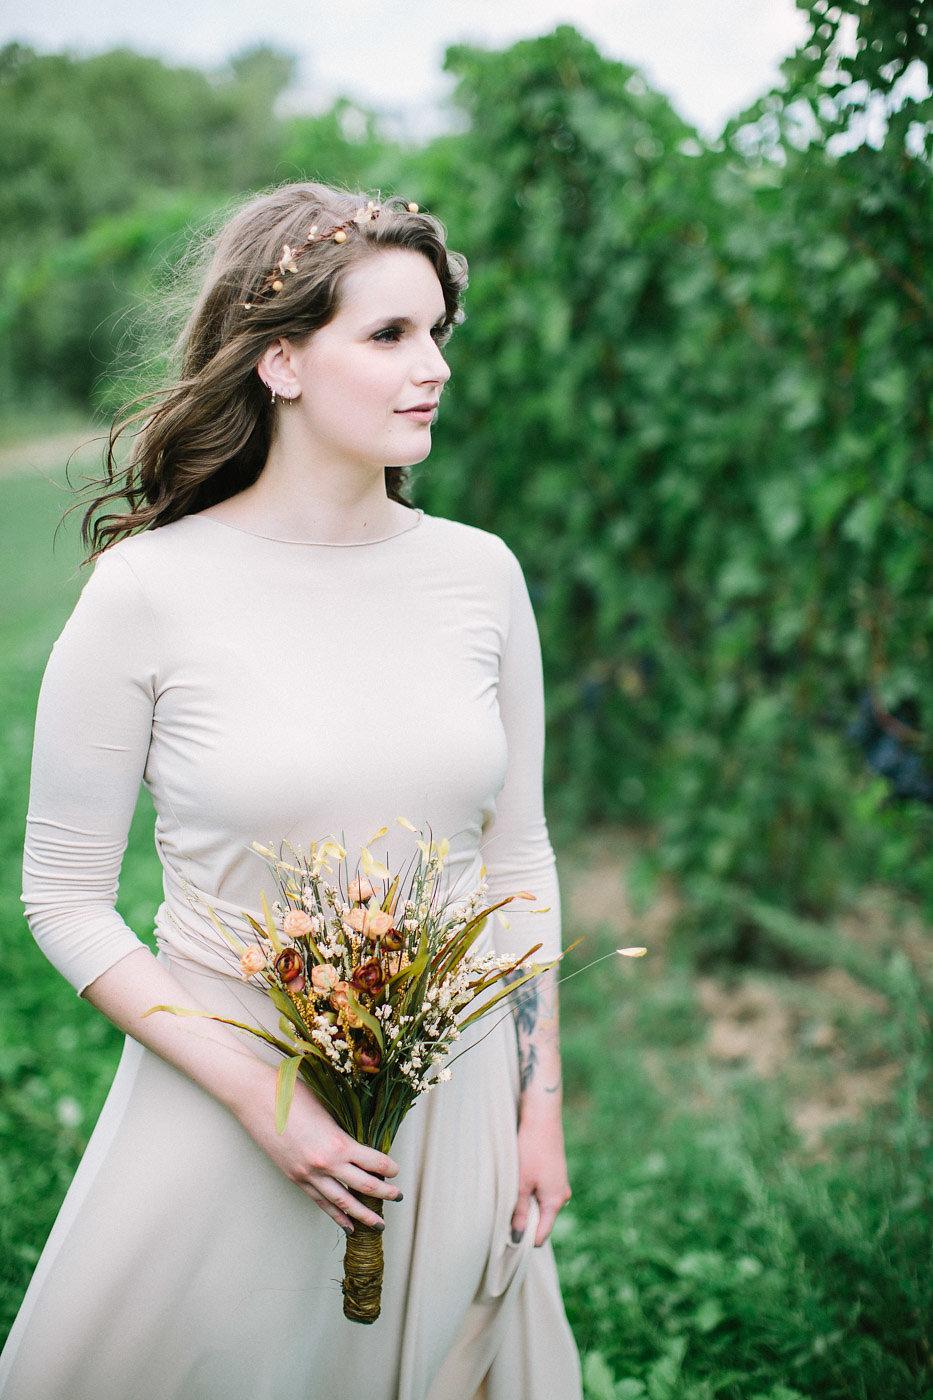 corynn-fowler-photography-vineyard-bride-swish-list-featherstone-winery-vineland-wedding-19.jpg